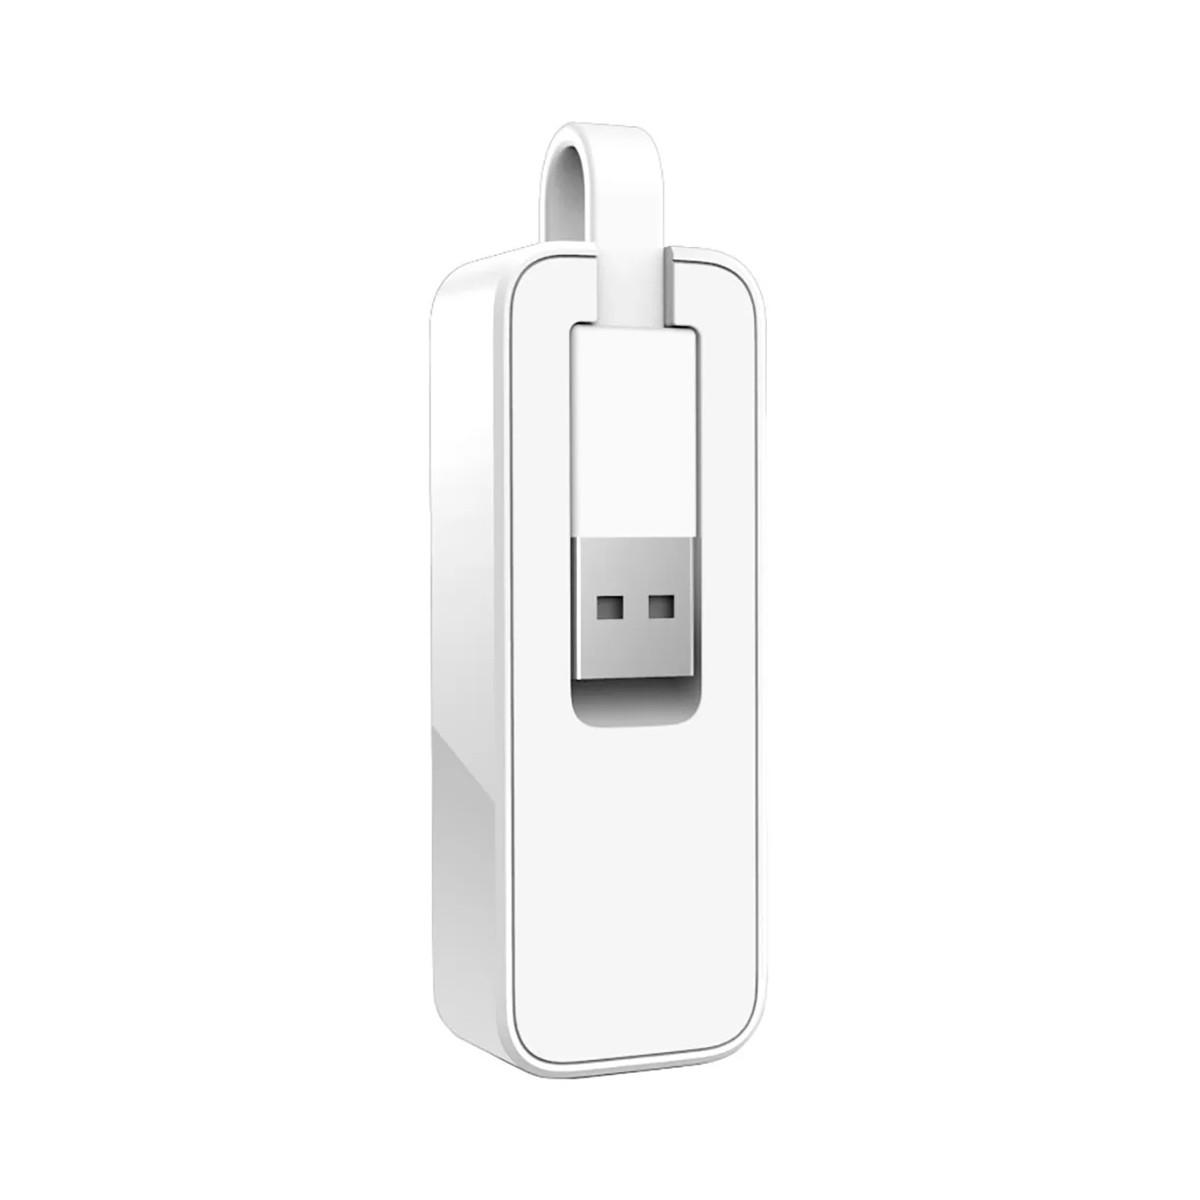 Adaptador De Rede Ethernet Gigabit UE300 USB 3.0 TP-Link